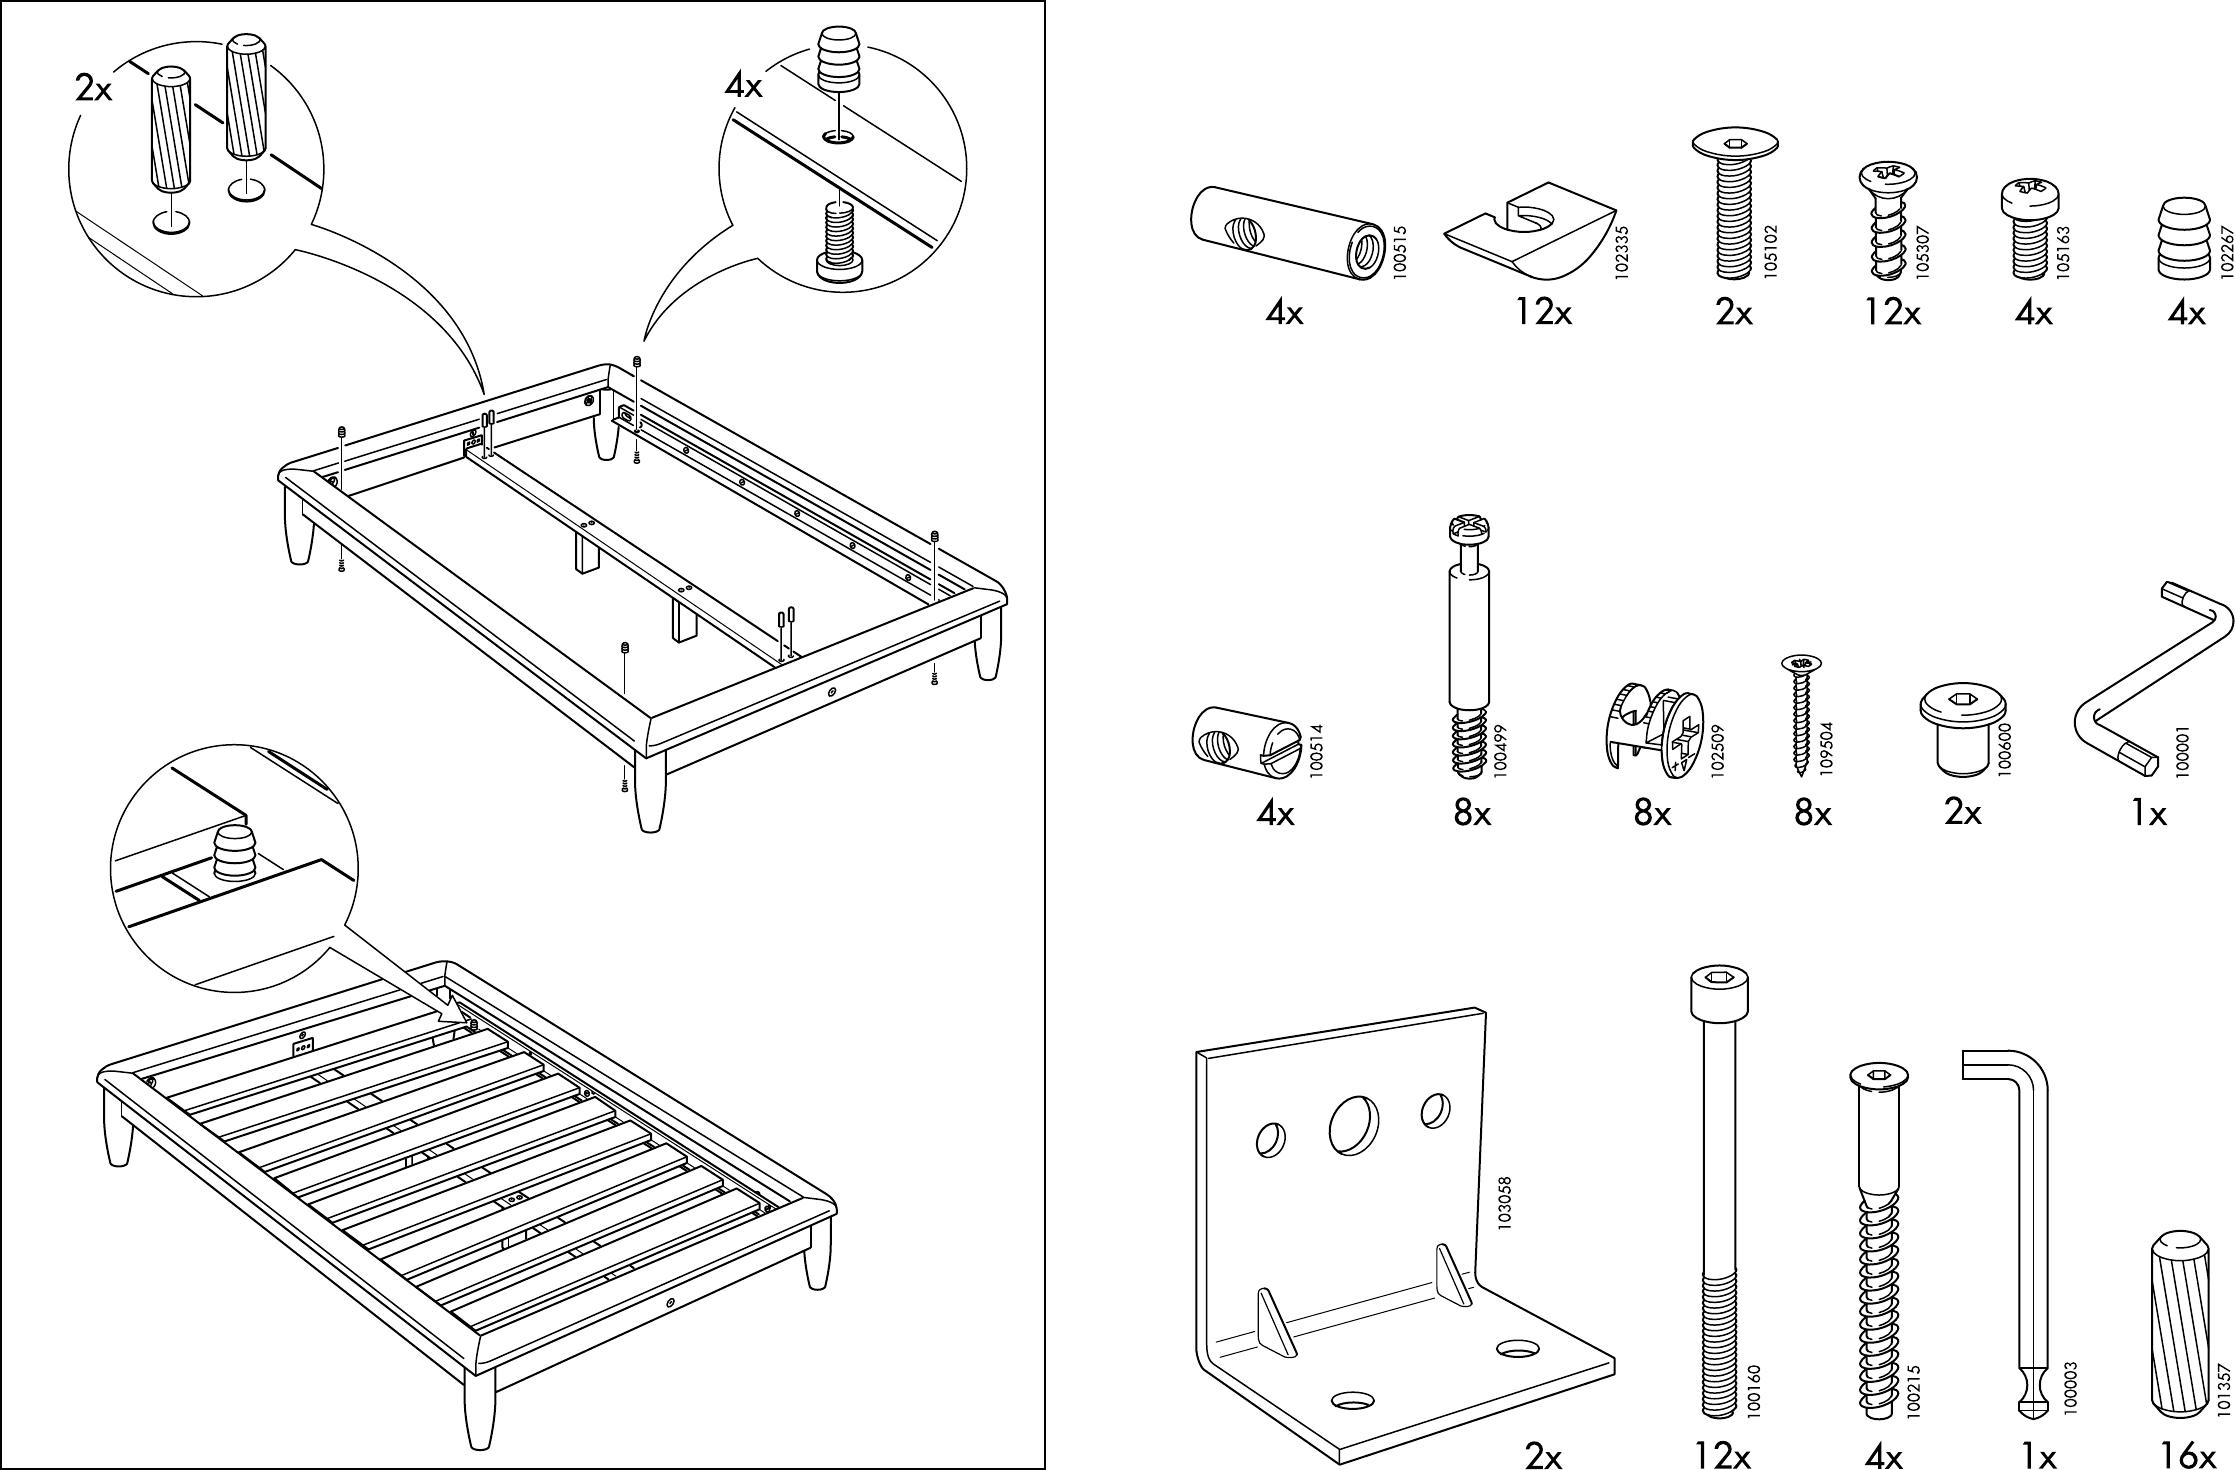 handleiding ikea hagali bedframe pagina 3 van 10 dansk deutsch english espan l fran ais. Black Bedroom Furniture Sets. Home Design Ideas